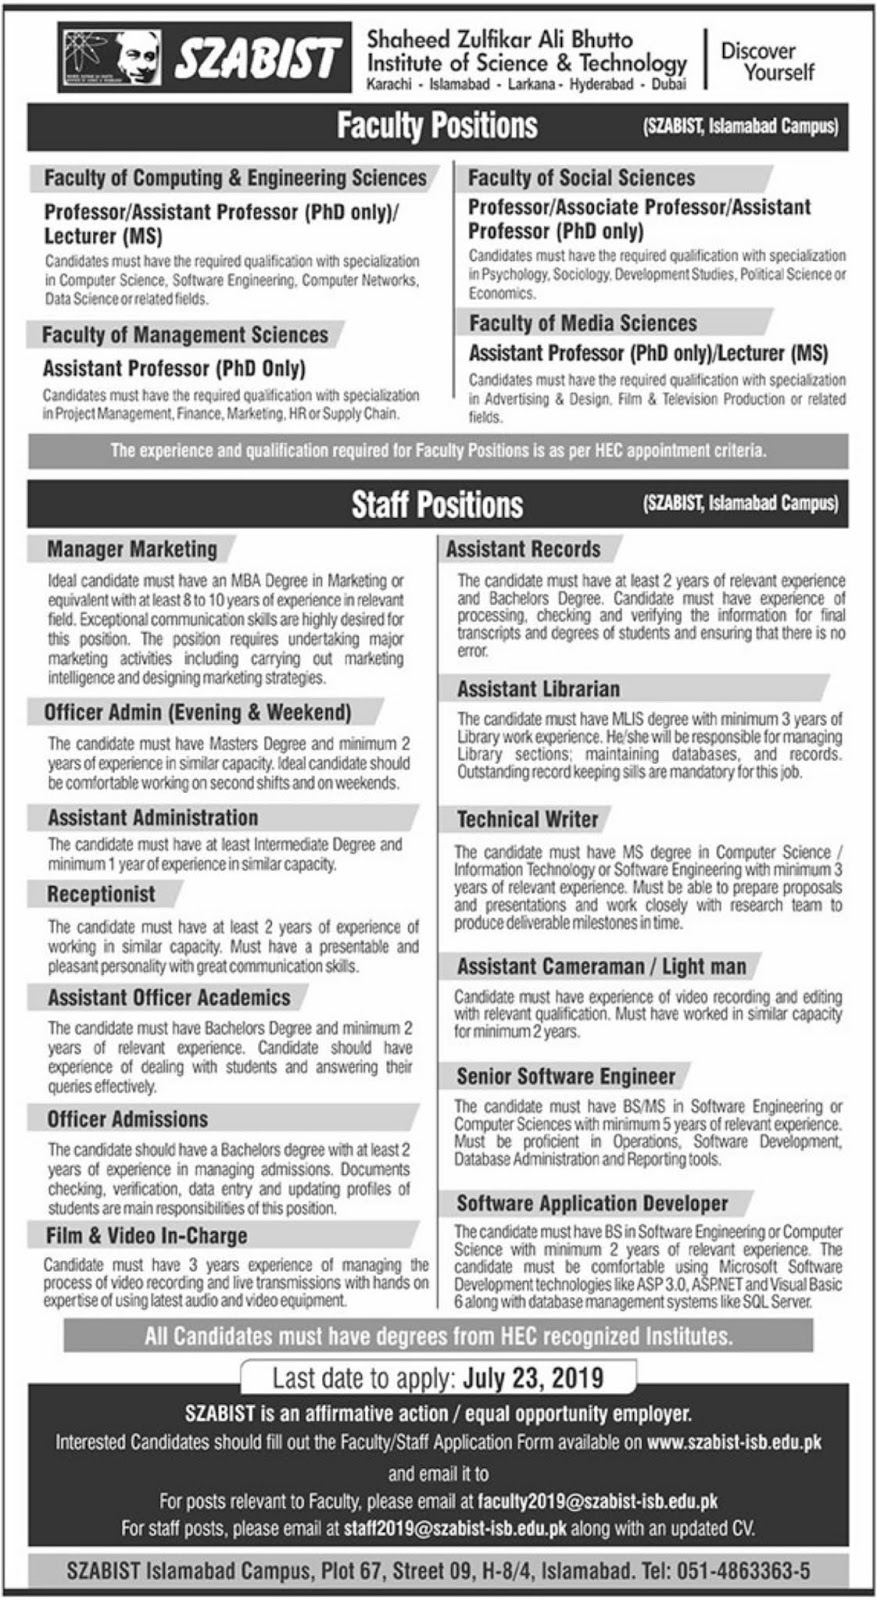 Shaheed Zulfikar Ali Bhutto Institute of Science & Technology SZABIST Jobs 2019